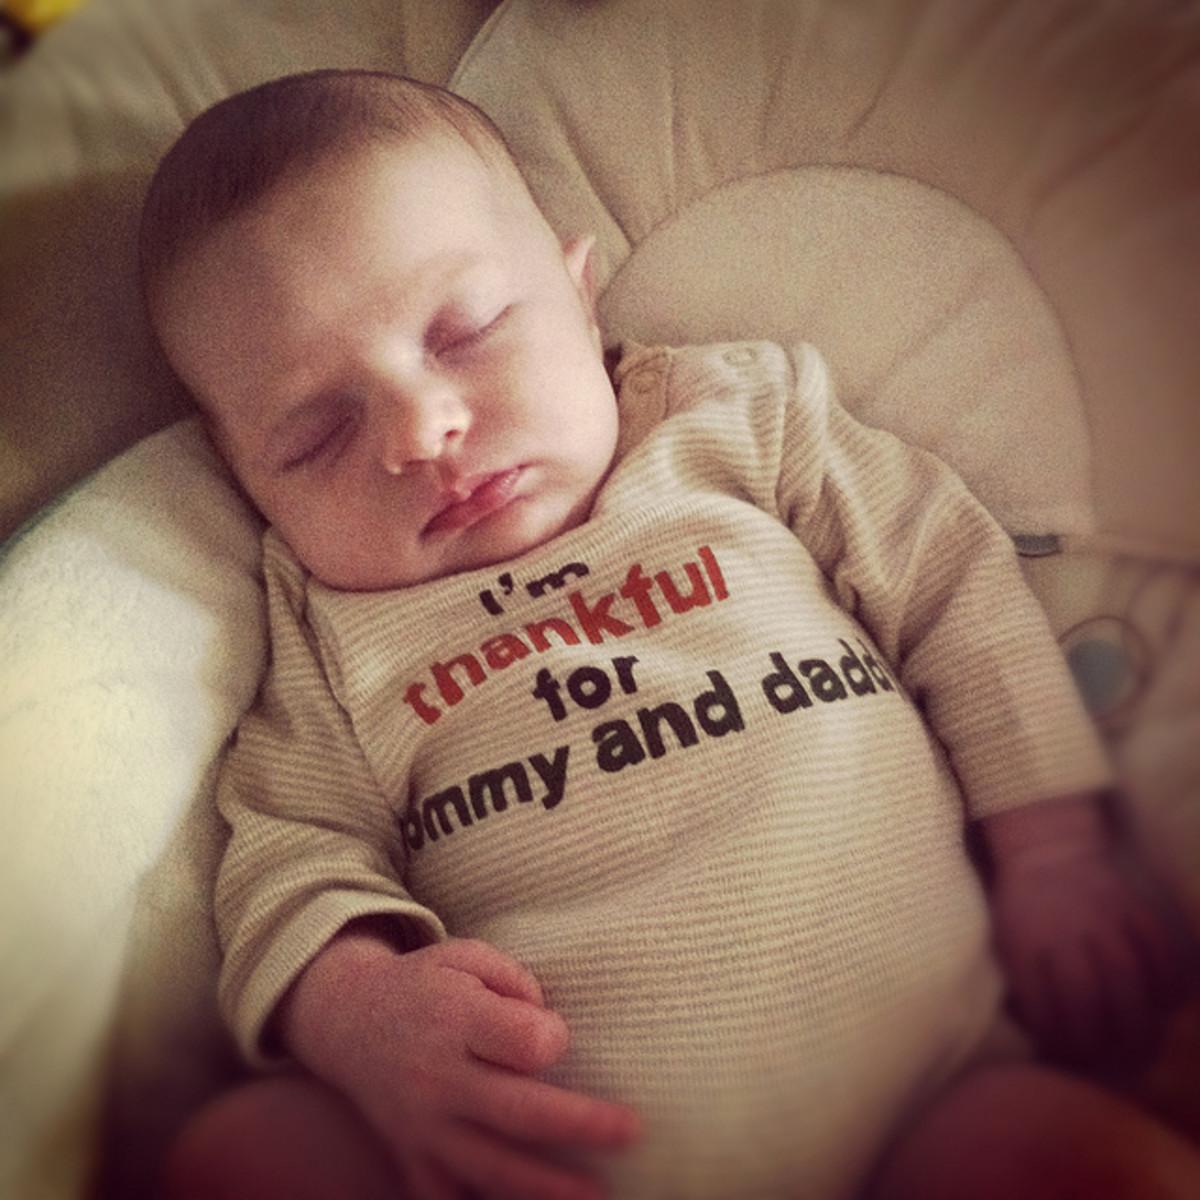 Naming an autumn baby can be a joy.